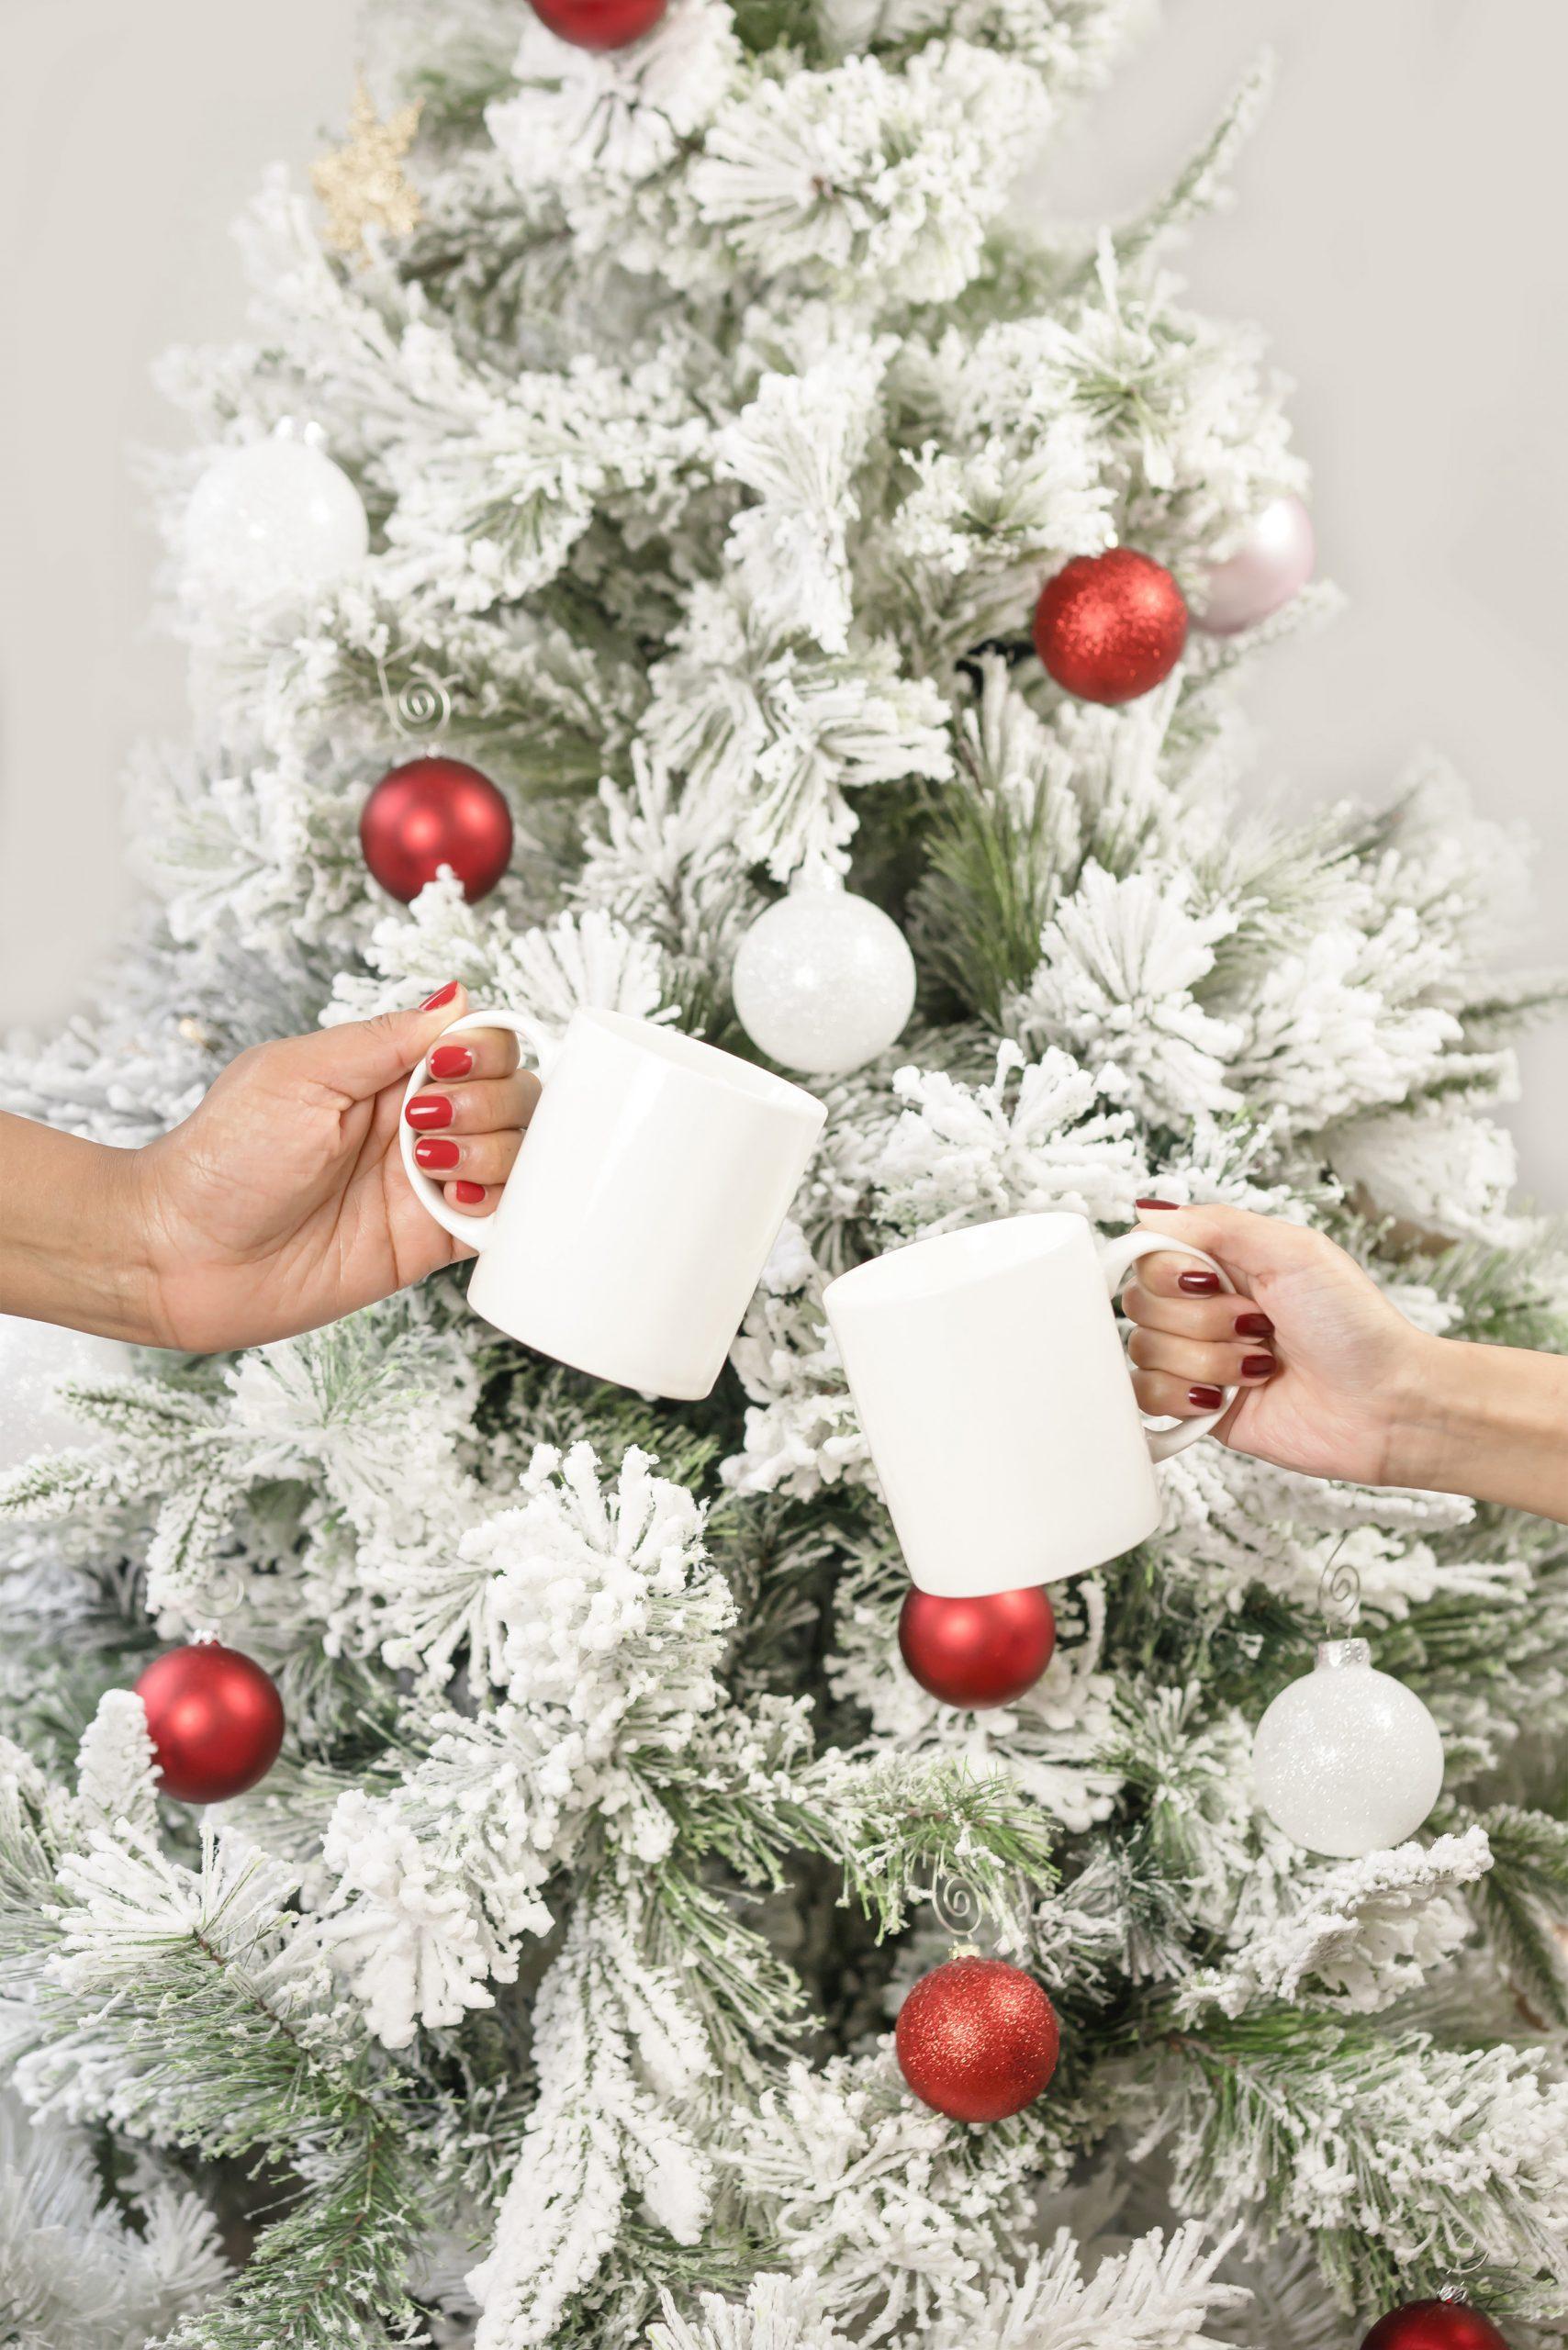 Blogmas Day 19: Diary Entry #30-Merry Christmas!